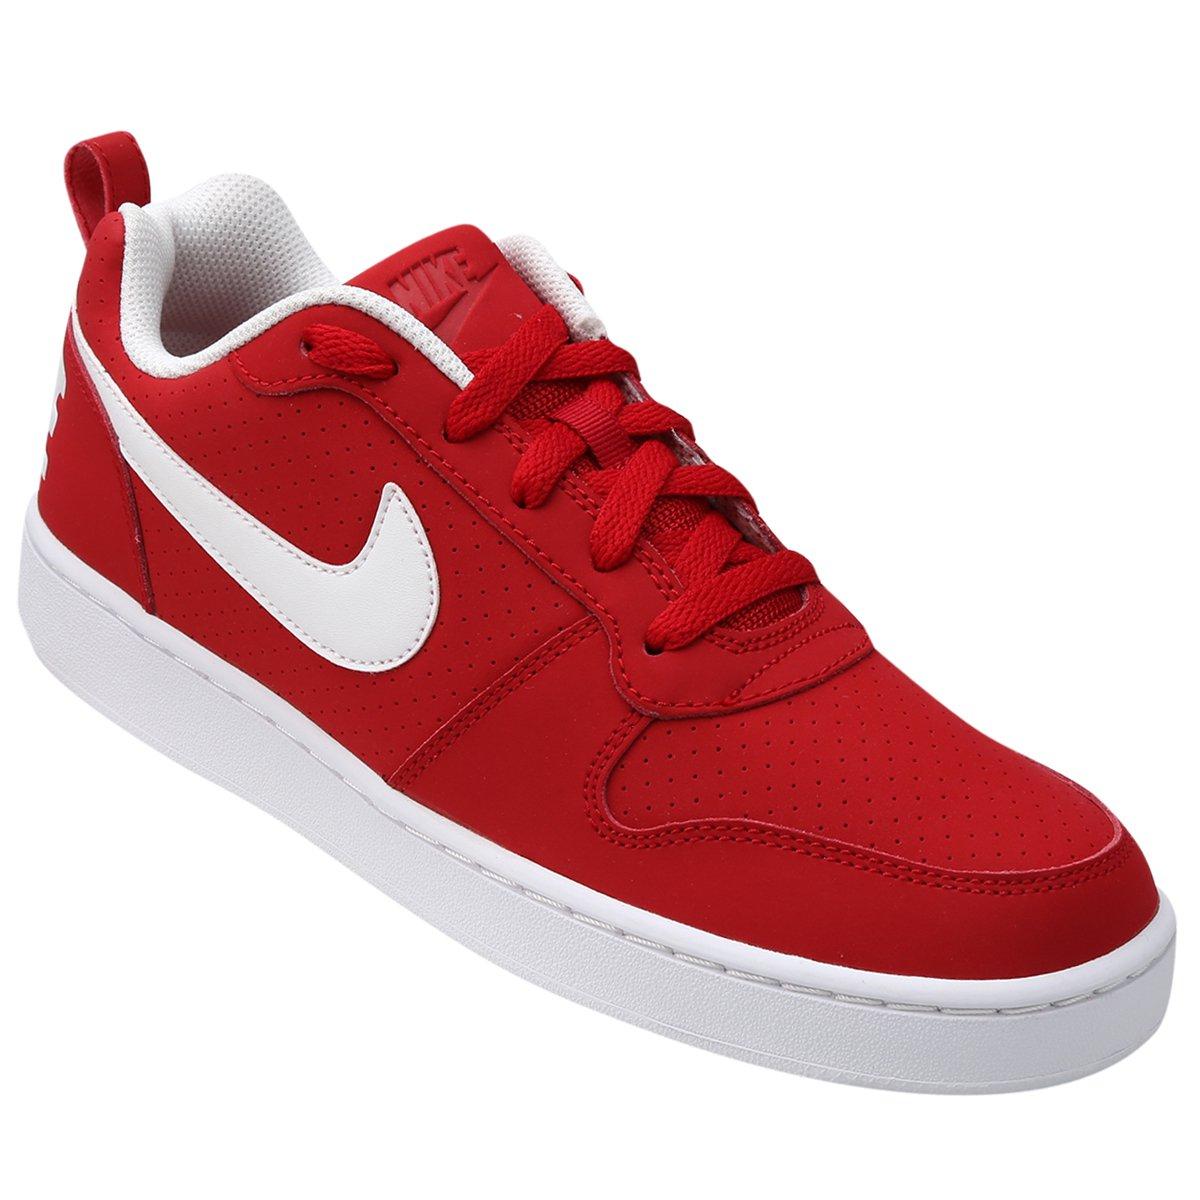 16bee74650c Tênis Nike Recreation Low Masculino - Compre Agora